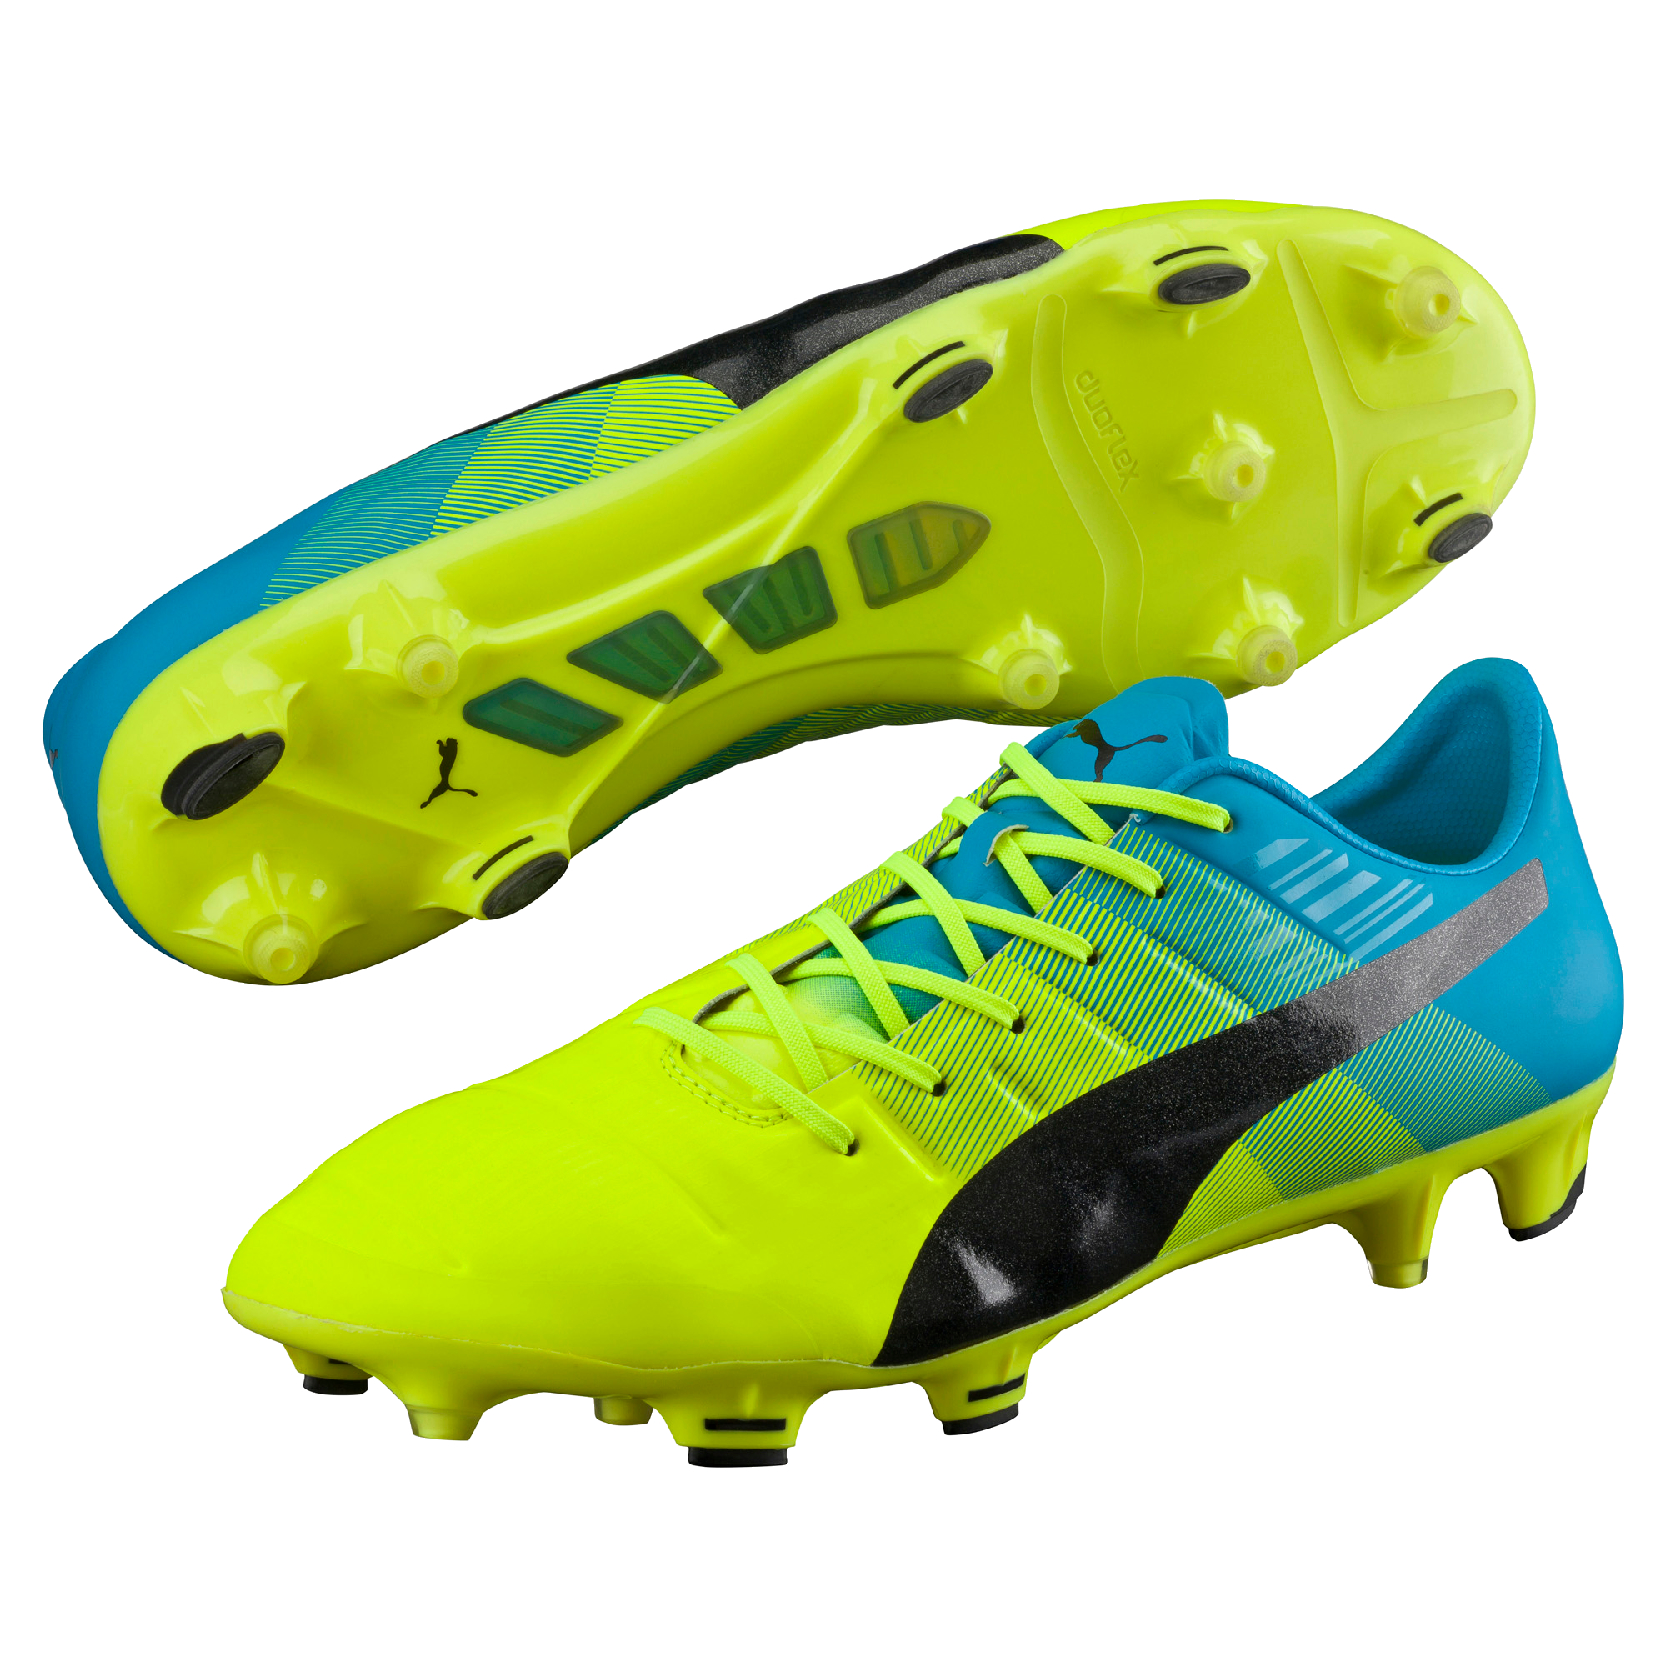 evoPower 1.3 Sepatu Sepakbola Generasi Terbaru Dari Puma - Bolalob.com 4aea7c83e0